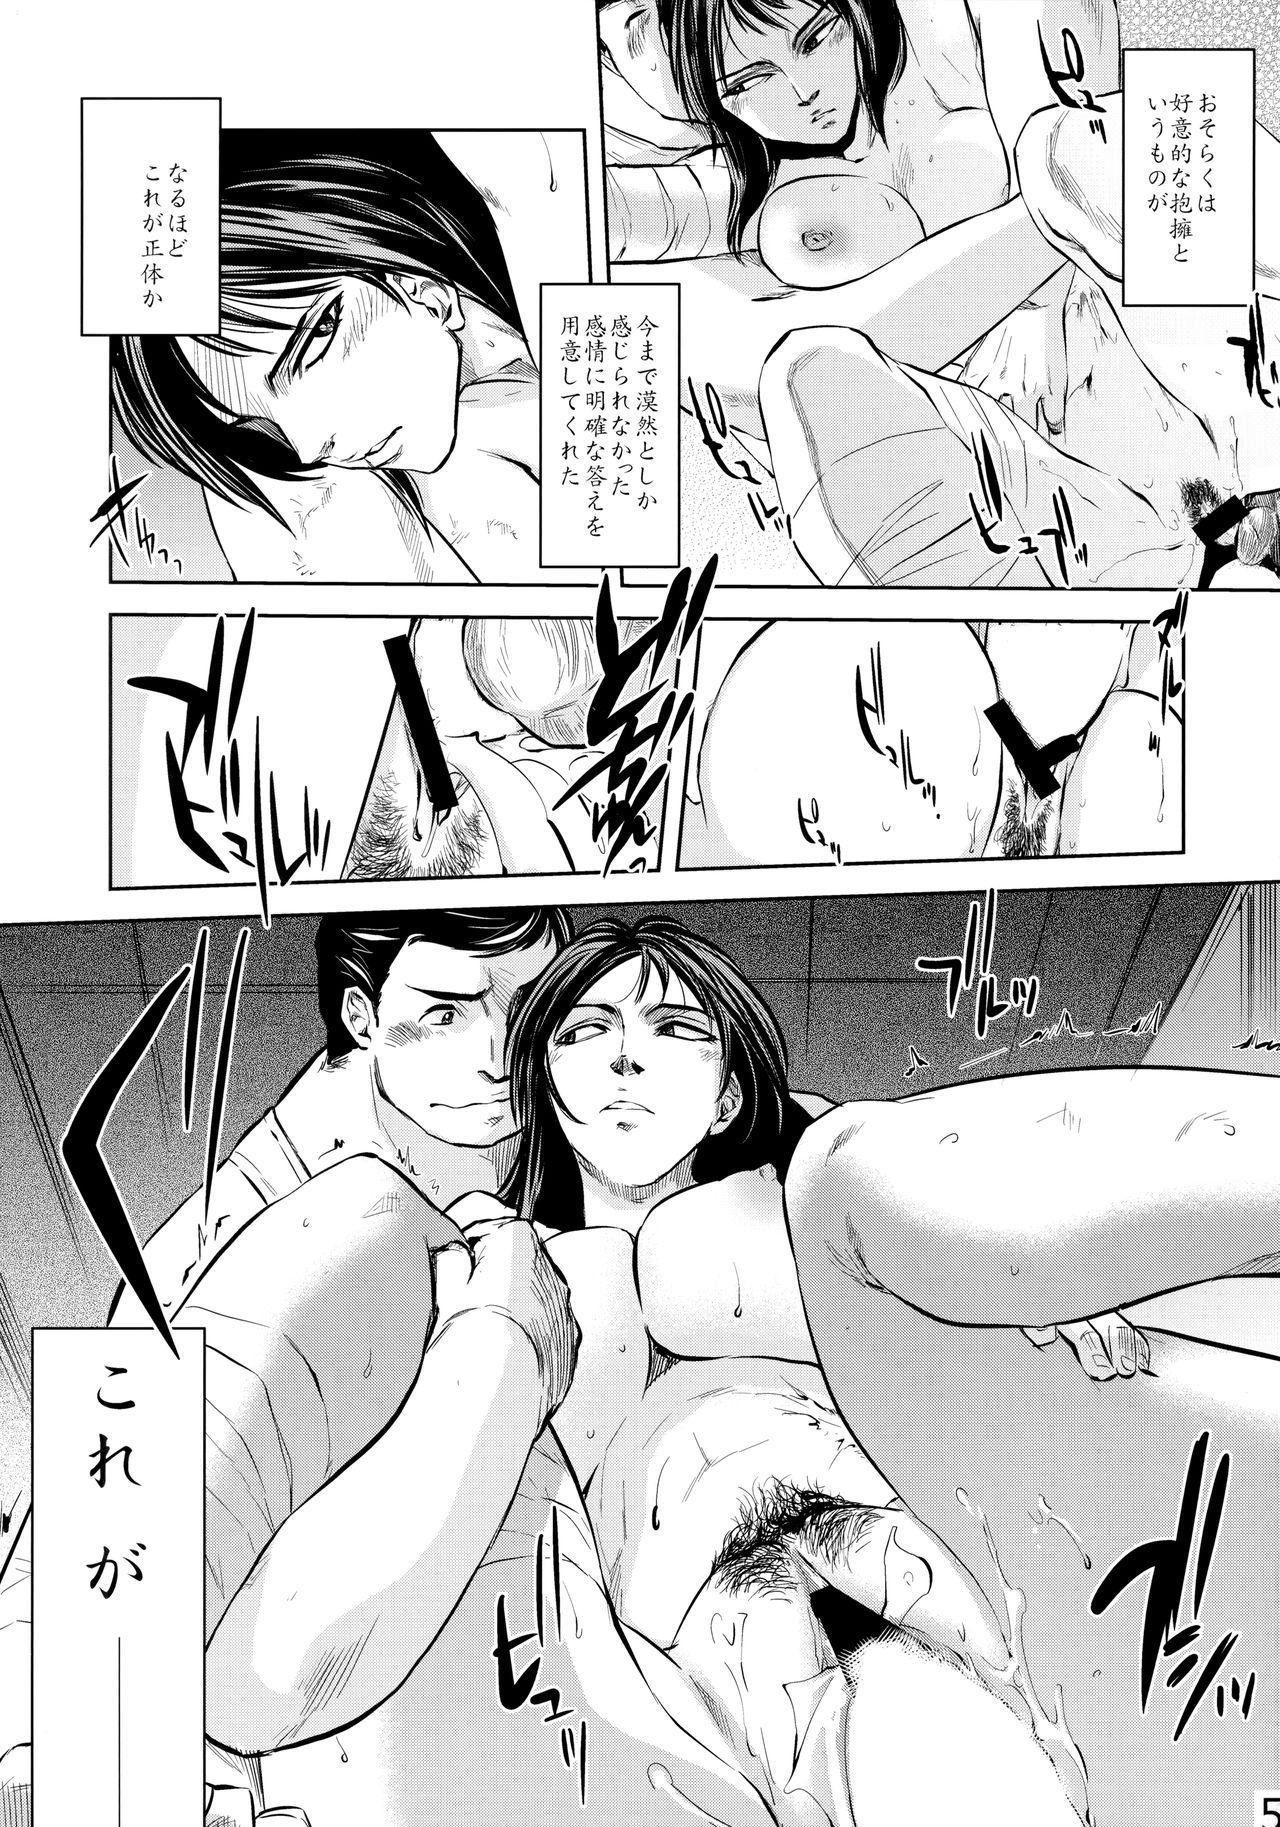 Yomeiri 49